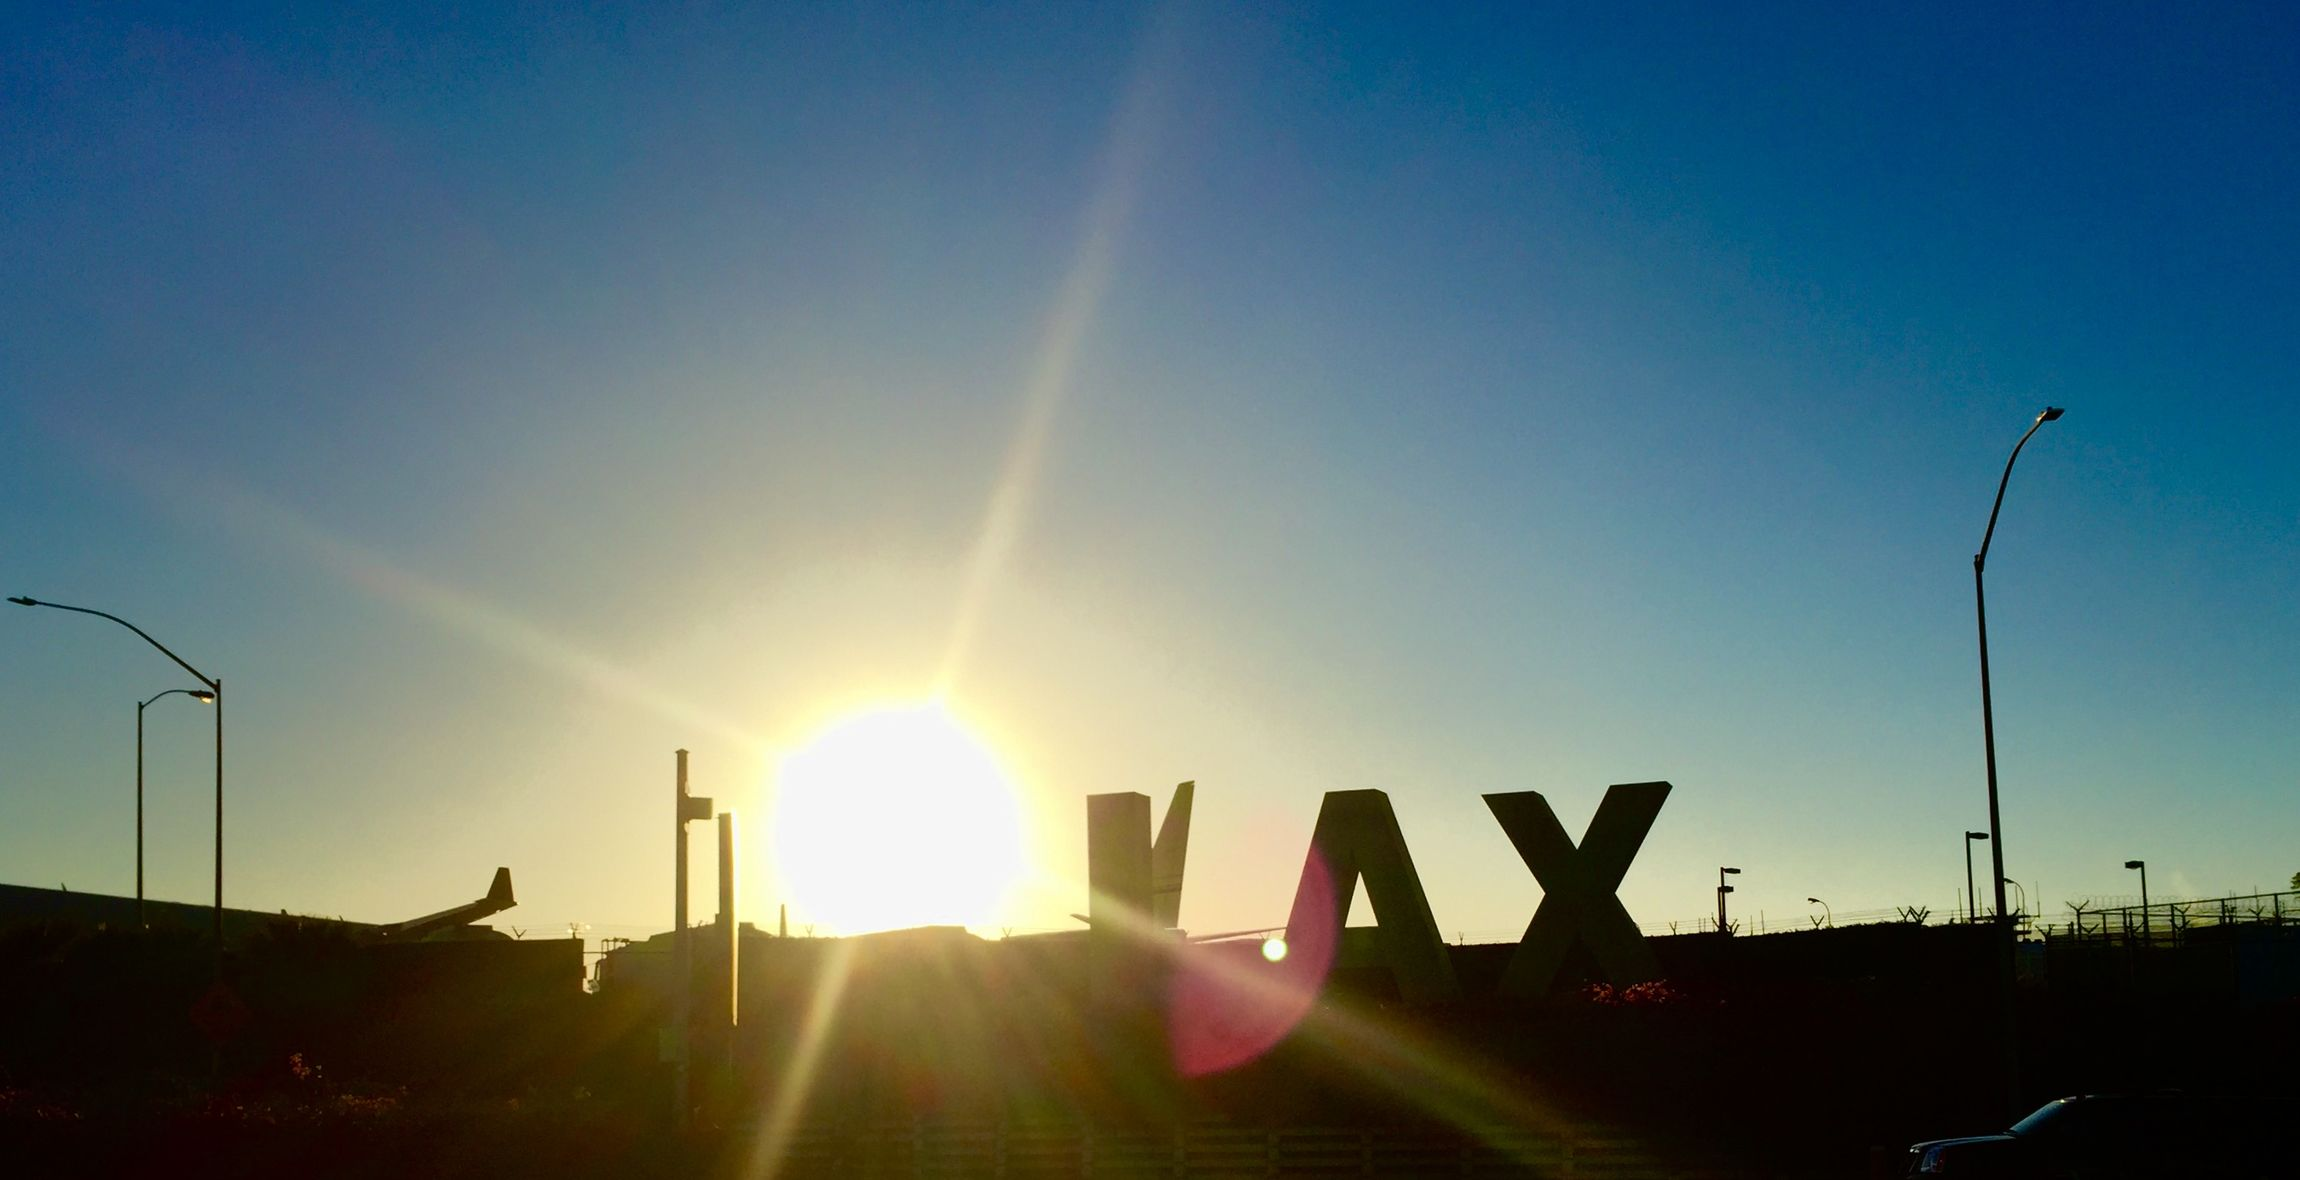 Sunset LAX LAX Sign